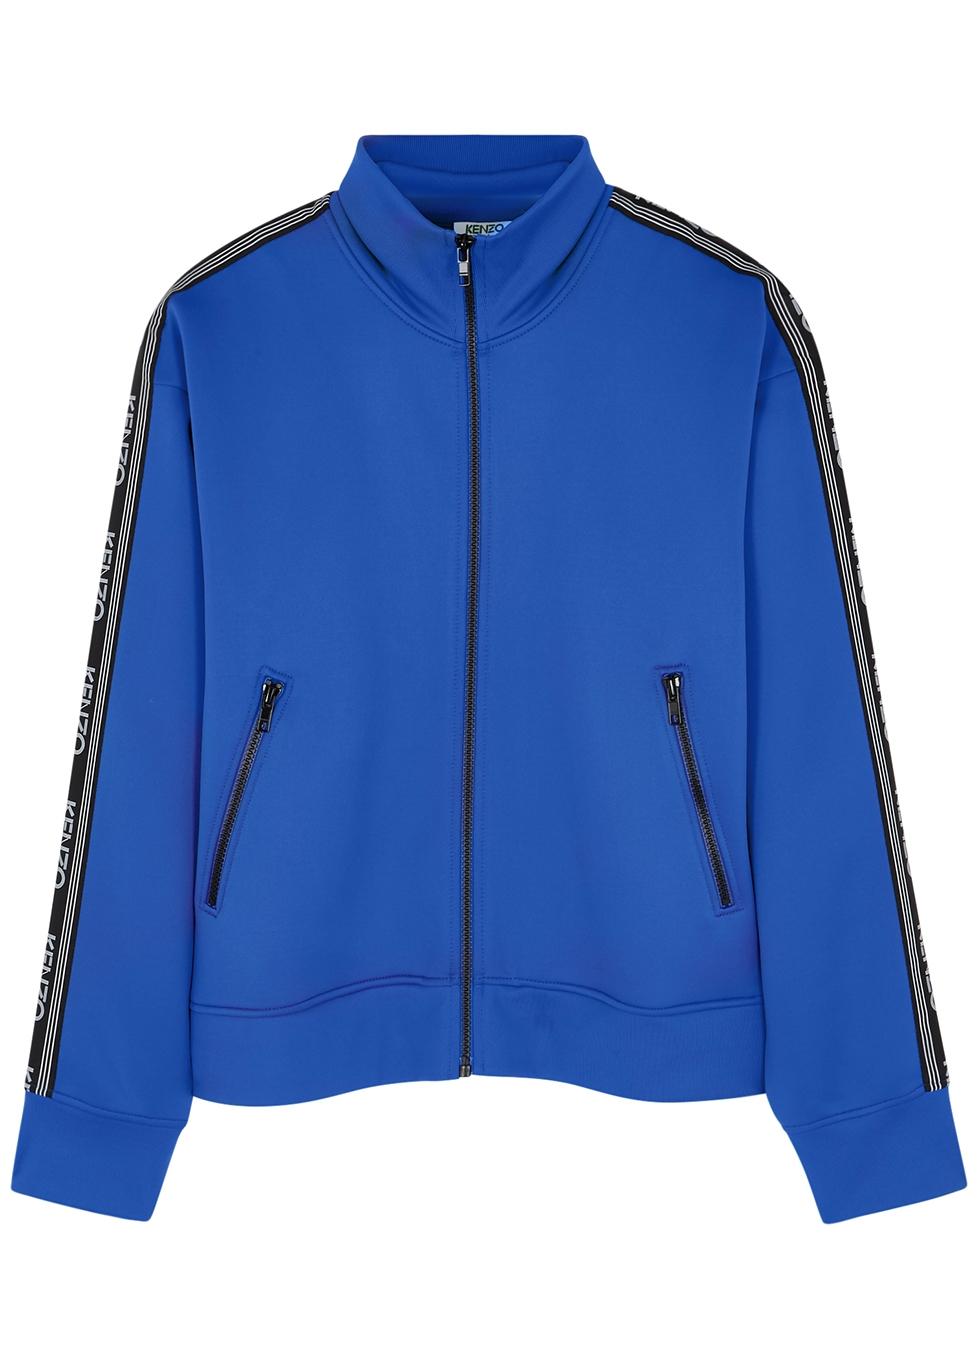 Blue logo jersey jacket - Kenzo